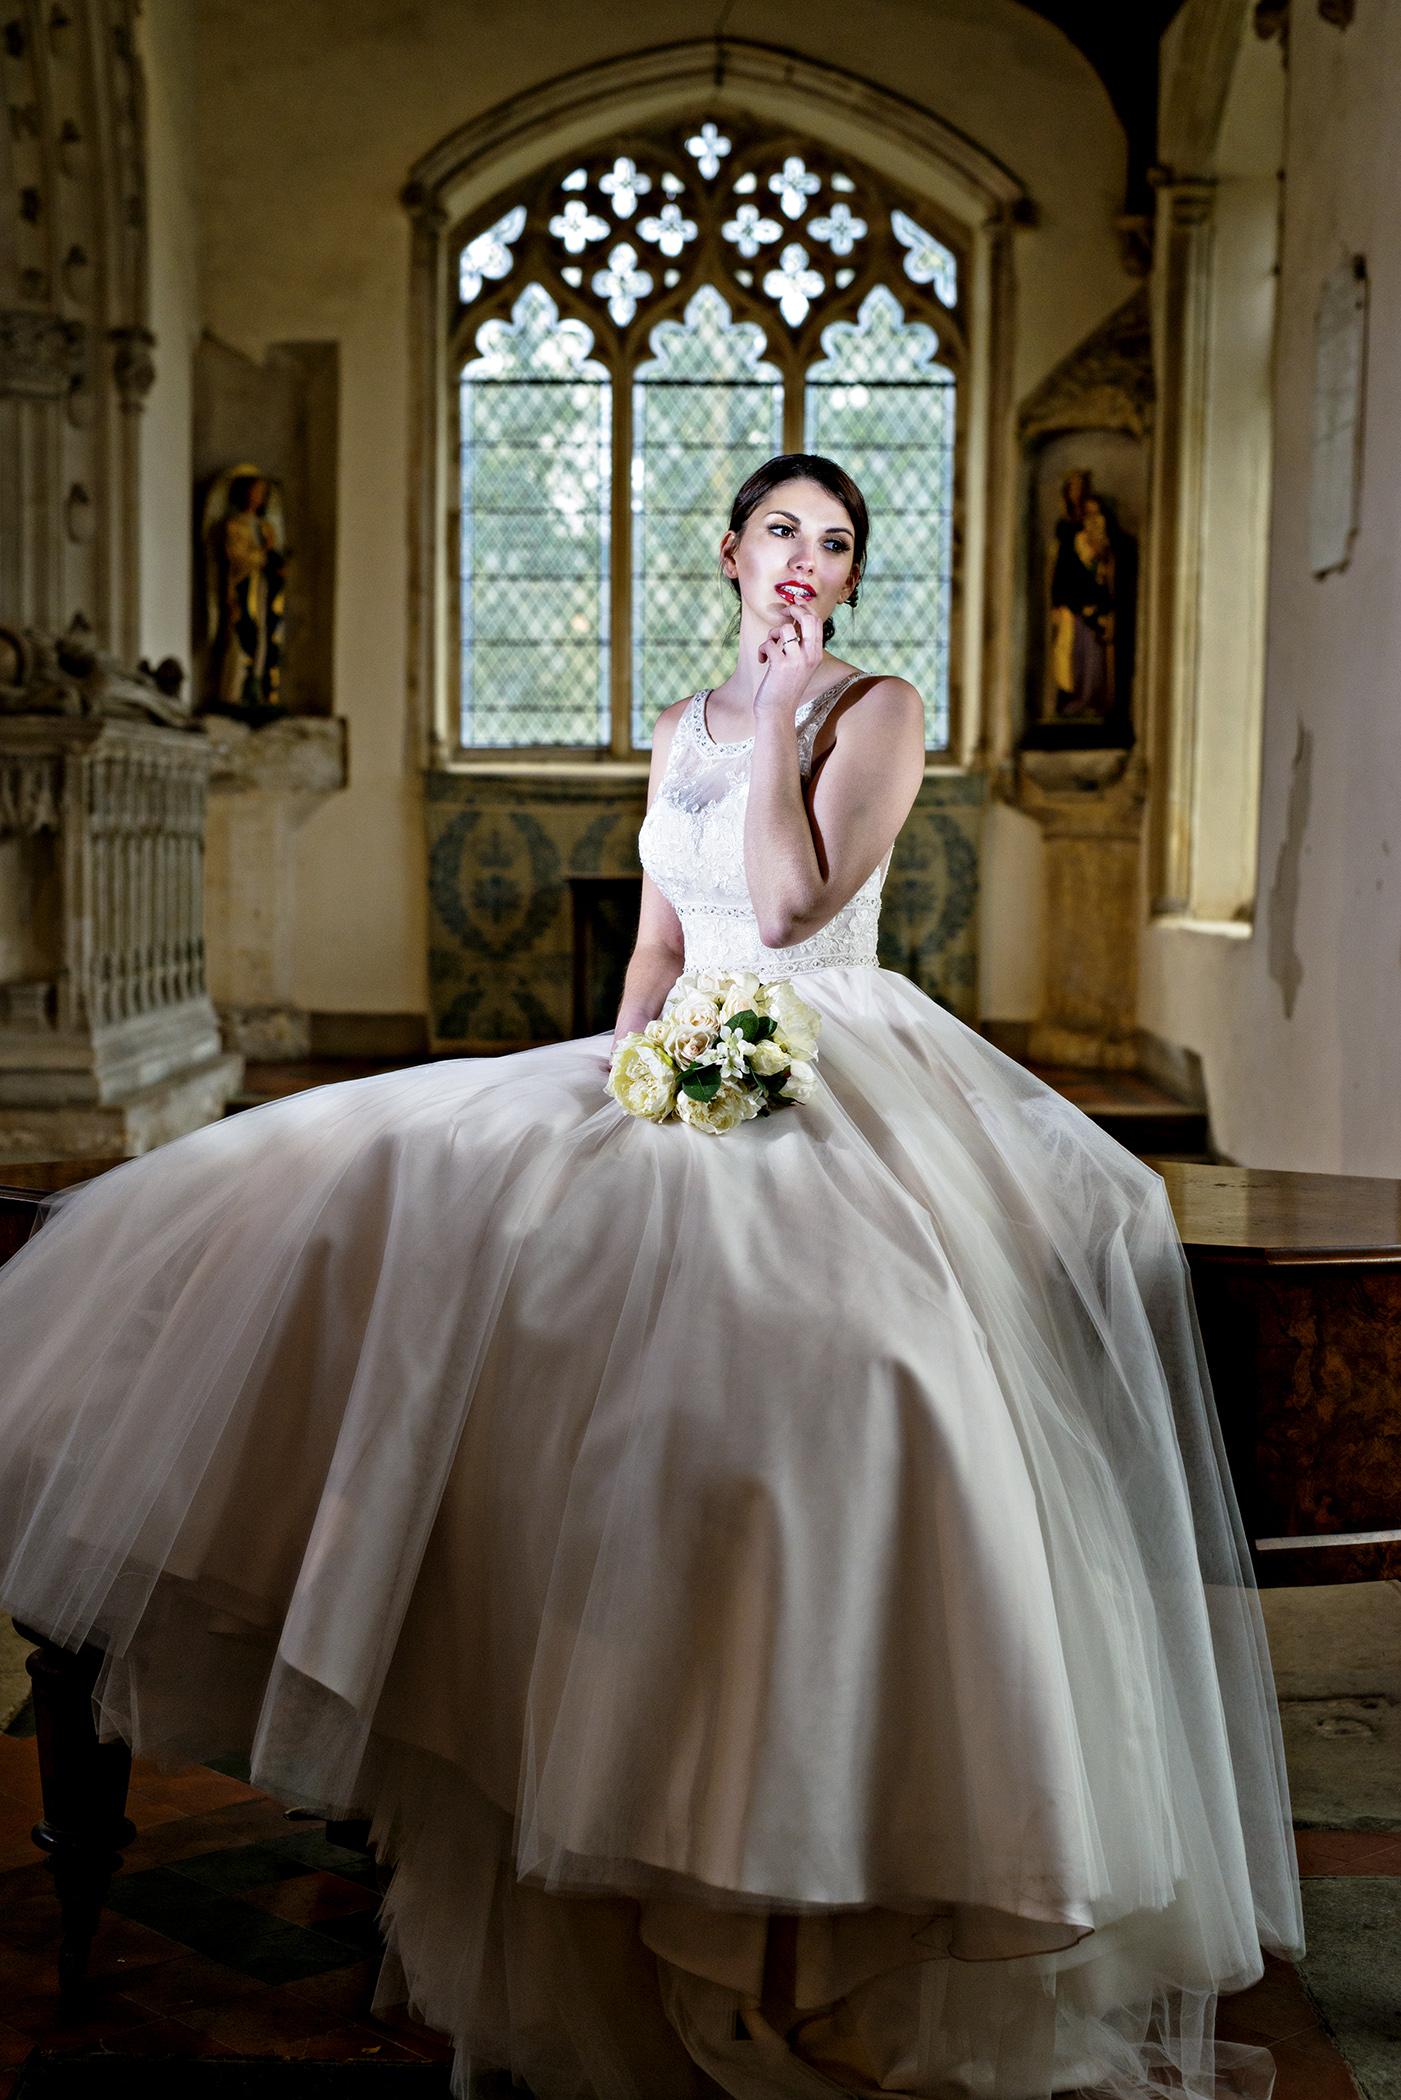 Bridal Fashions DSC_6744 copy.jpg